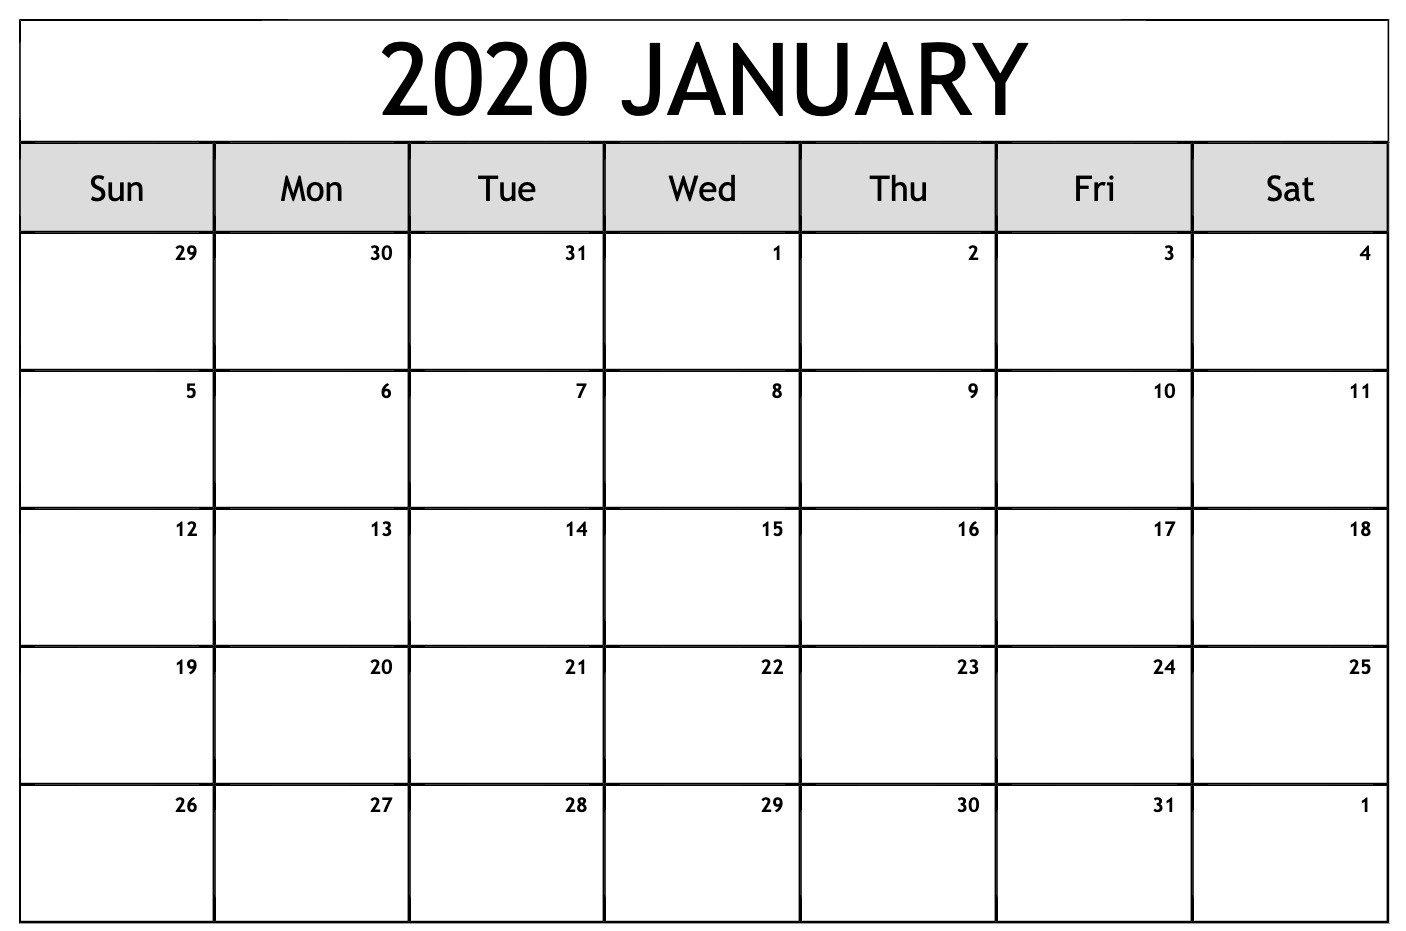 2020 Calendar You Can Edit | Calendar Printables Free Calendars That You Can Edit